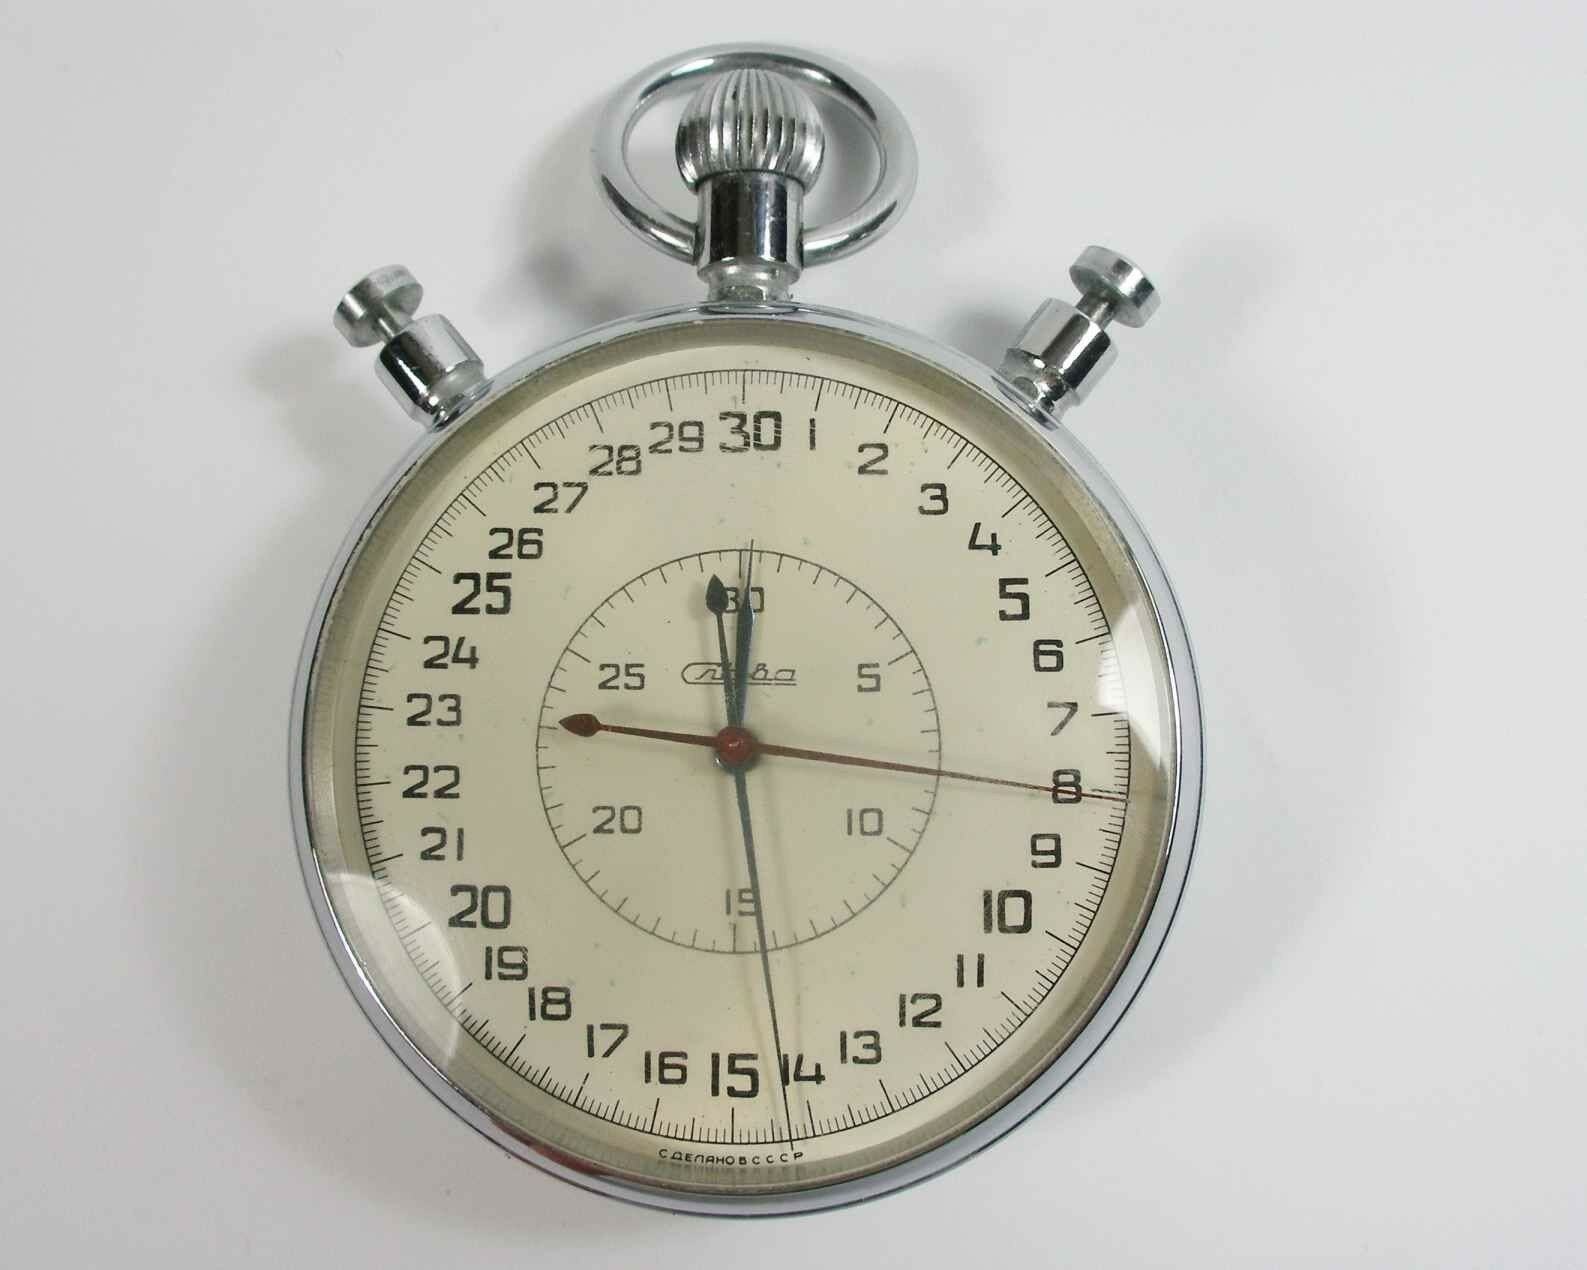 Slava Ruso Soviético de parada reloj mecánico cronómetro URSS (sl14)